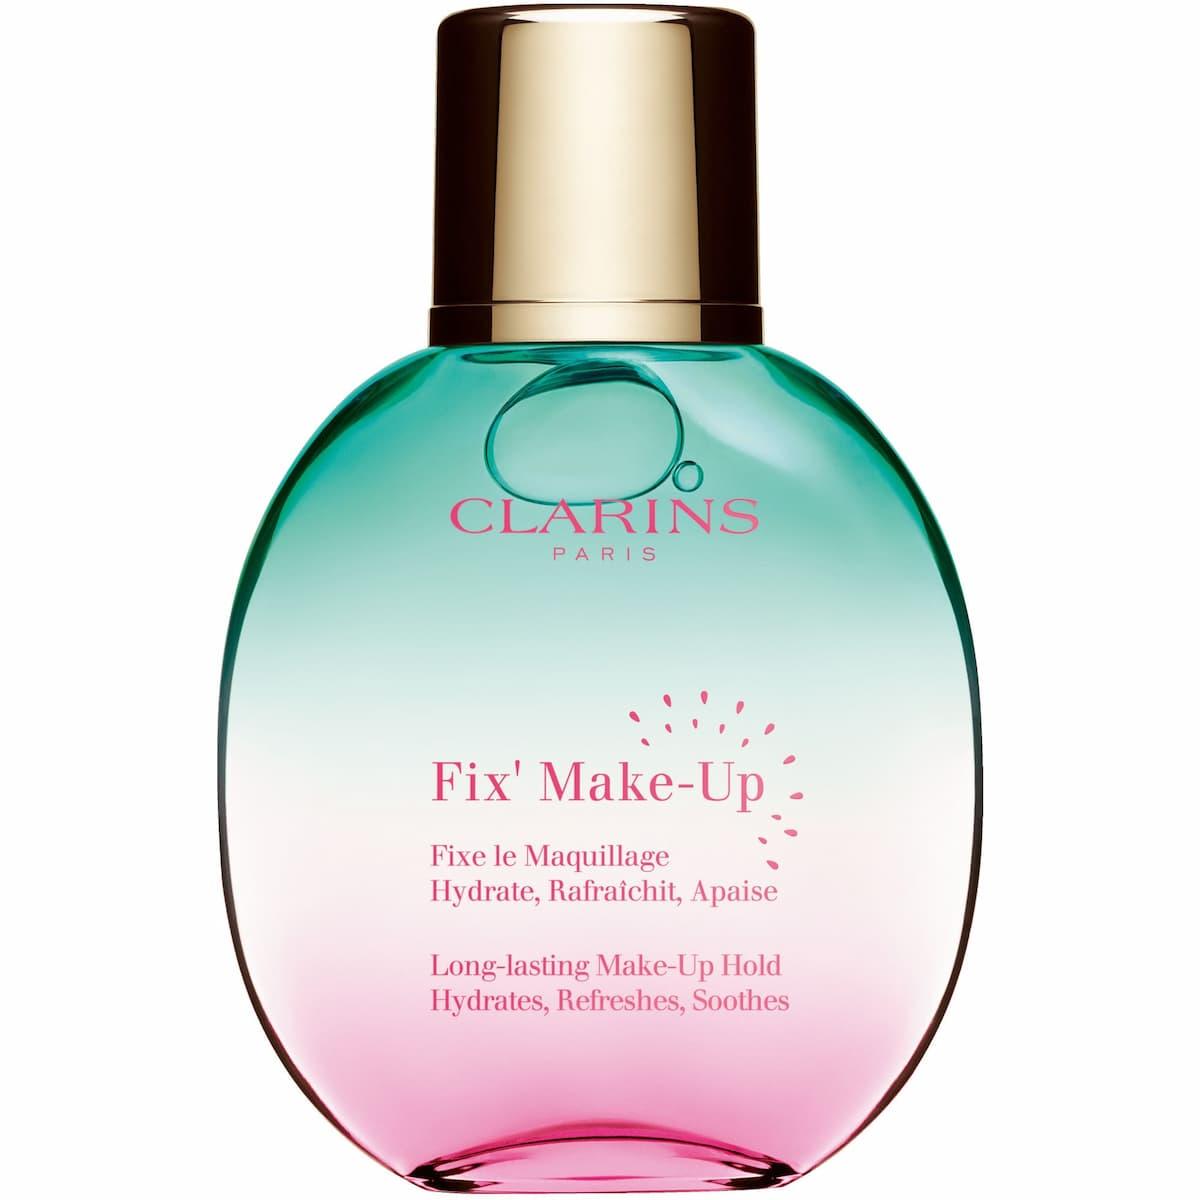 Clarins - Fix' Make-Up - Brume fixante été